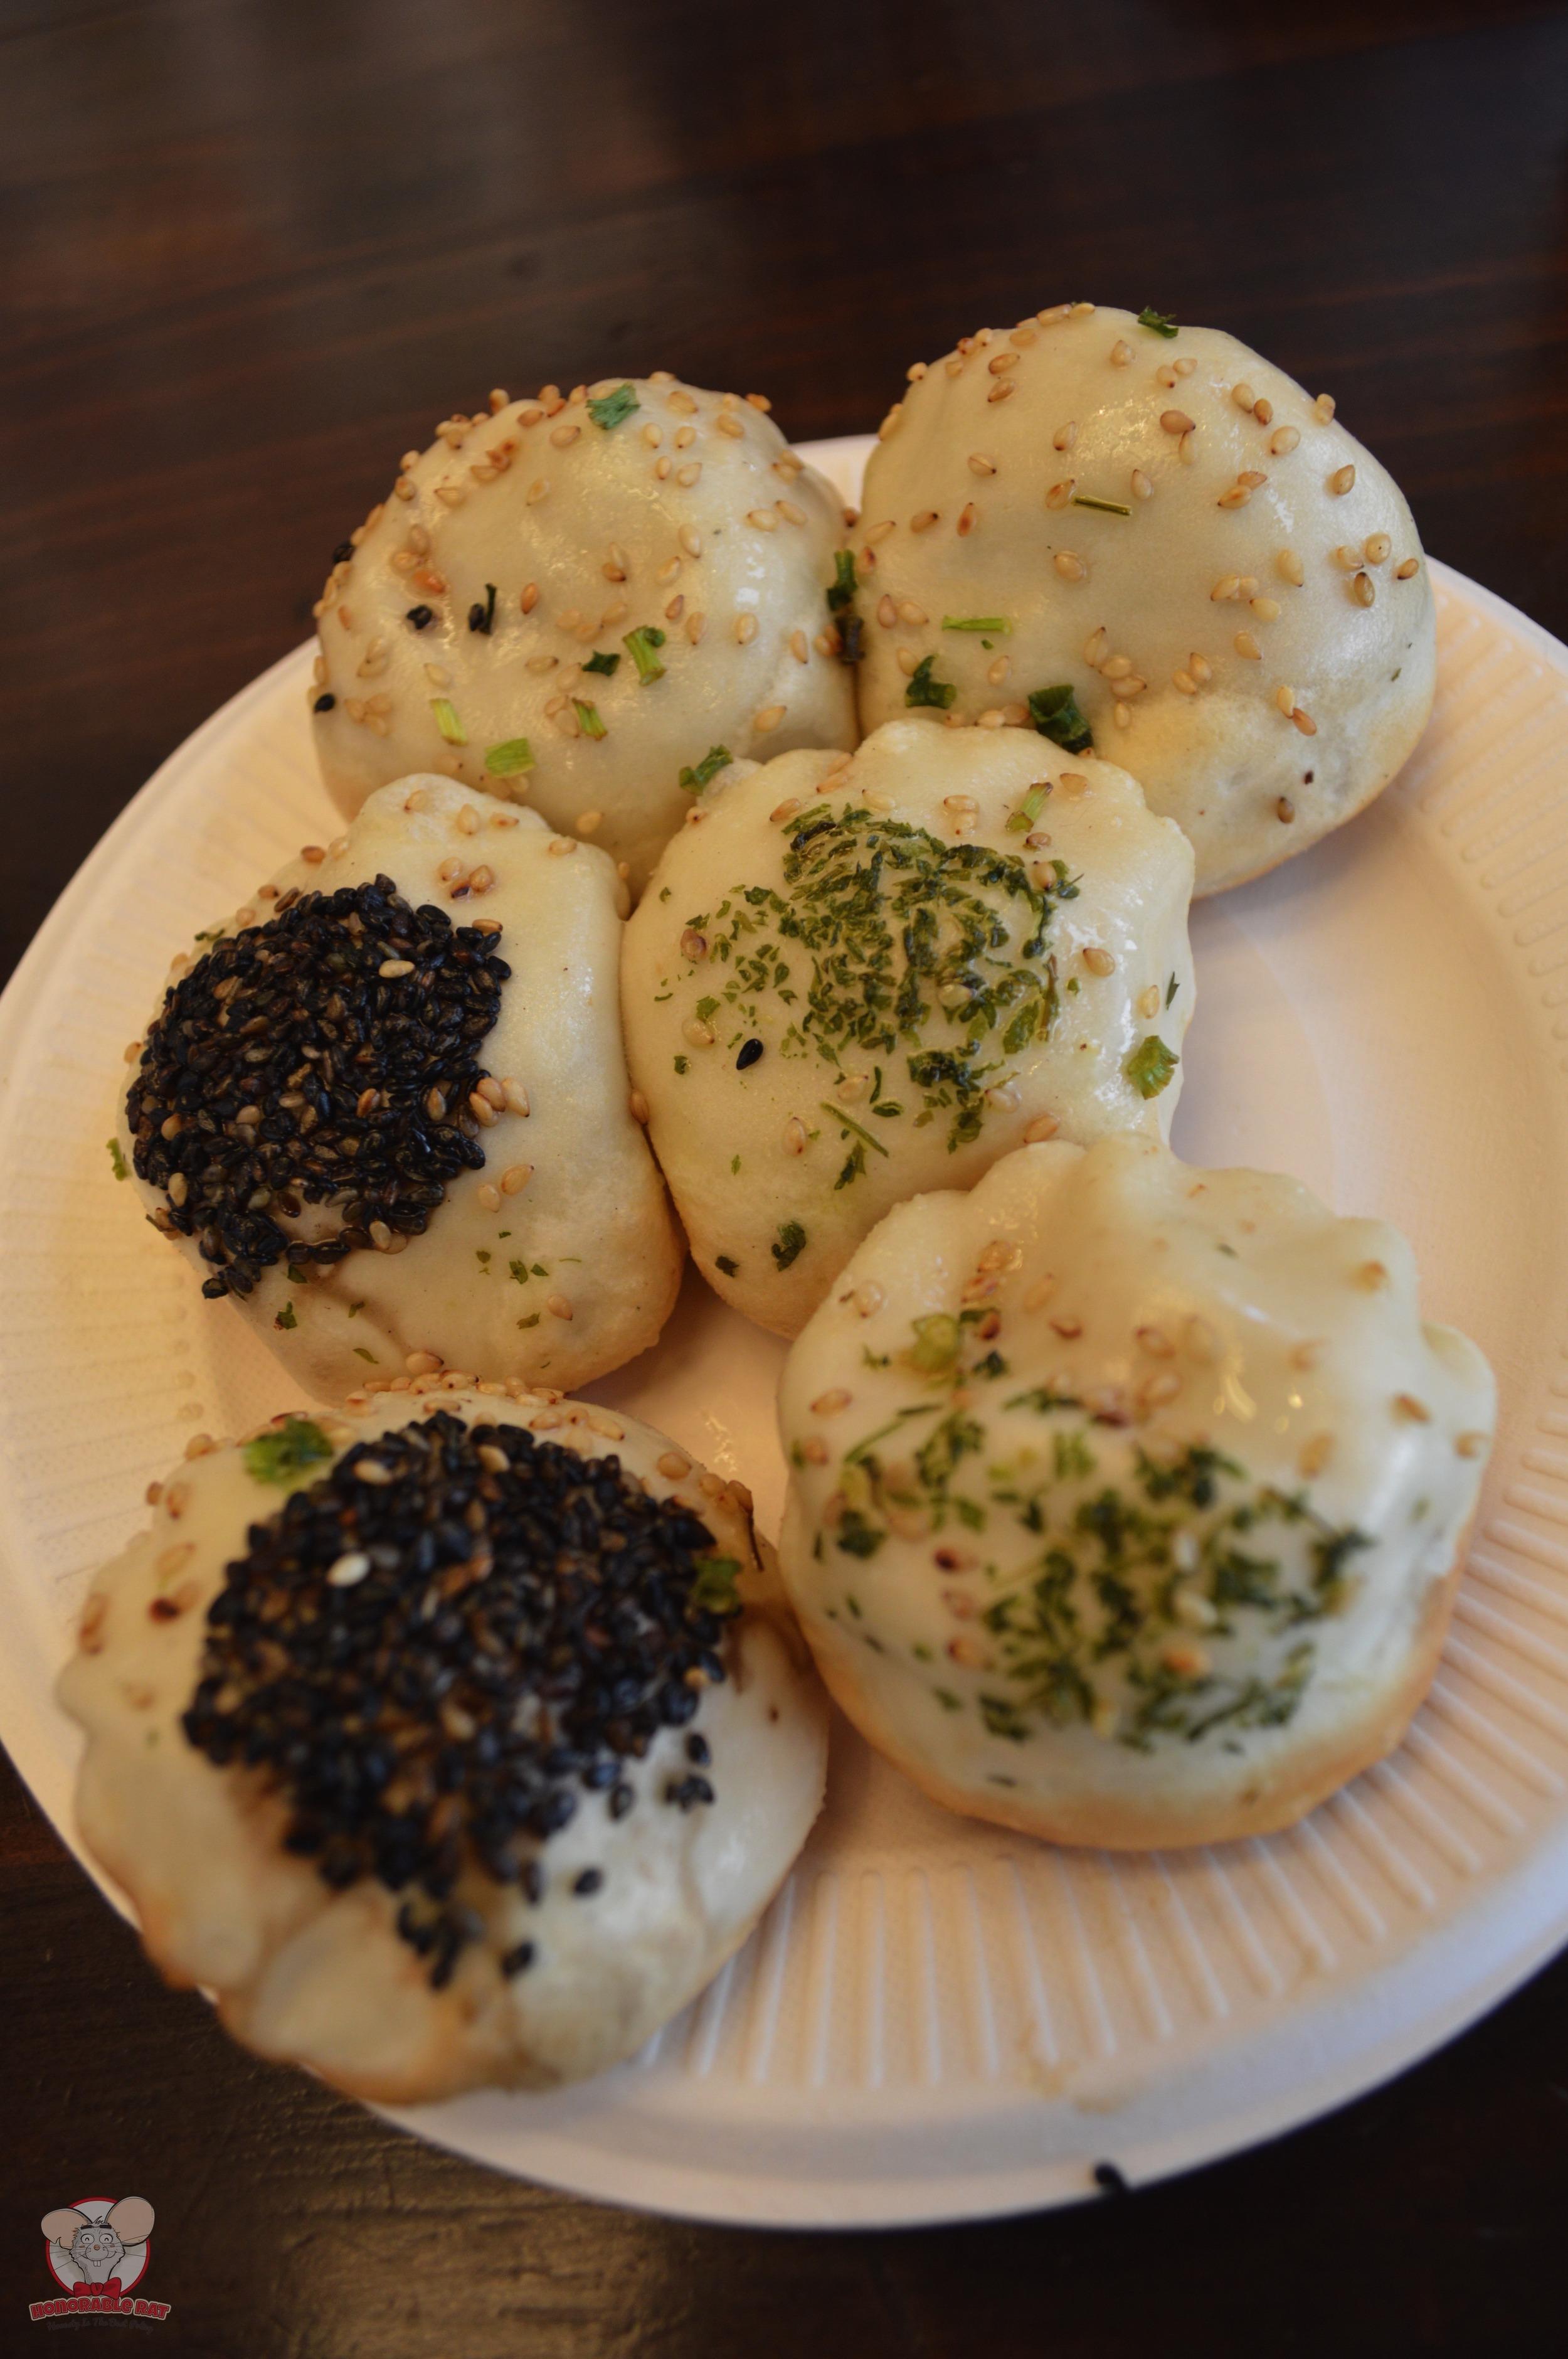 6 pieces of assorted Xiao Long Bao